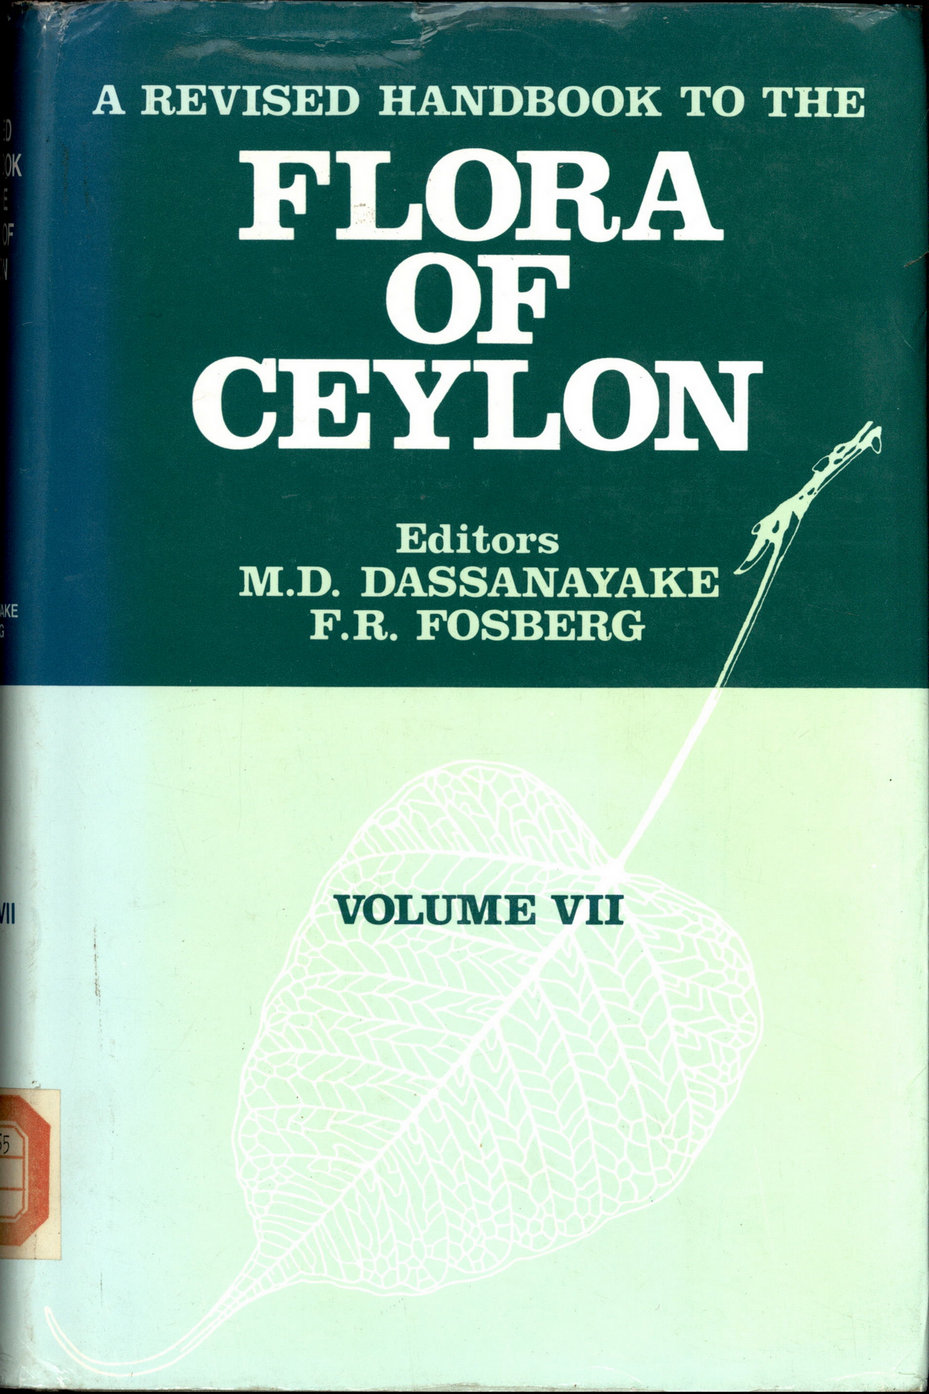 A REVISED HANDBOOK TO THE FLORA OF CEYLON VOLUME Ⅶ